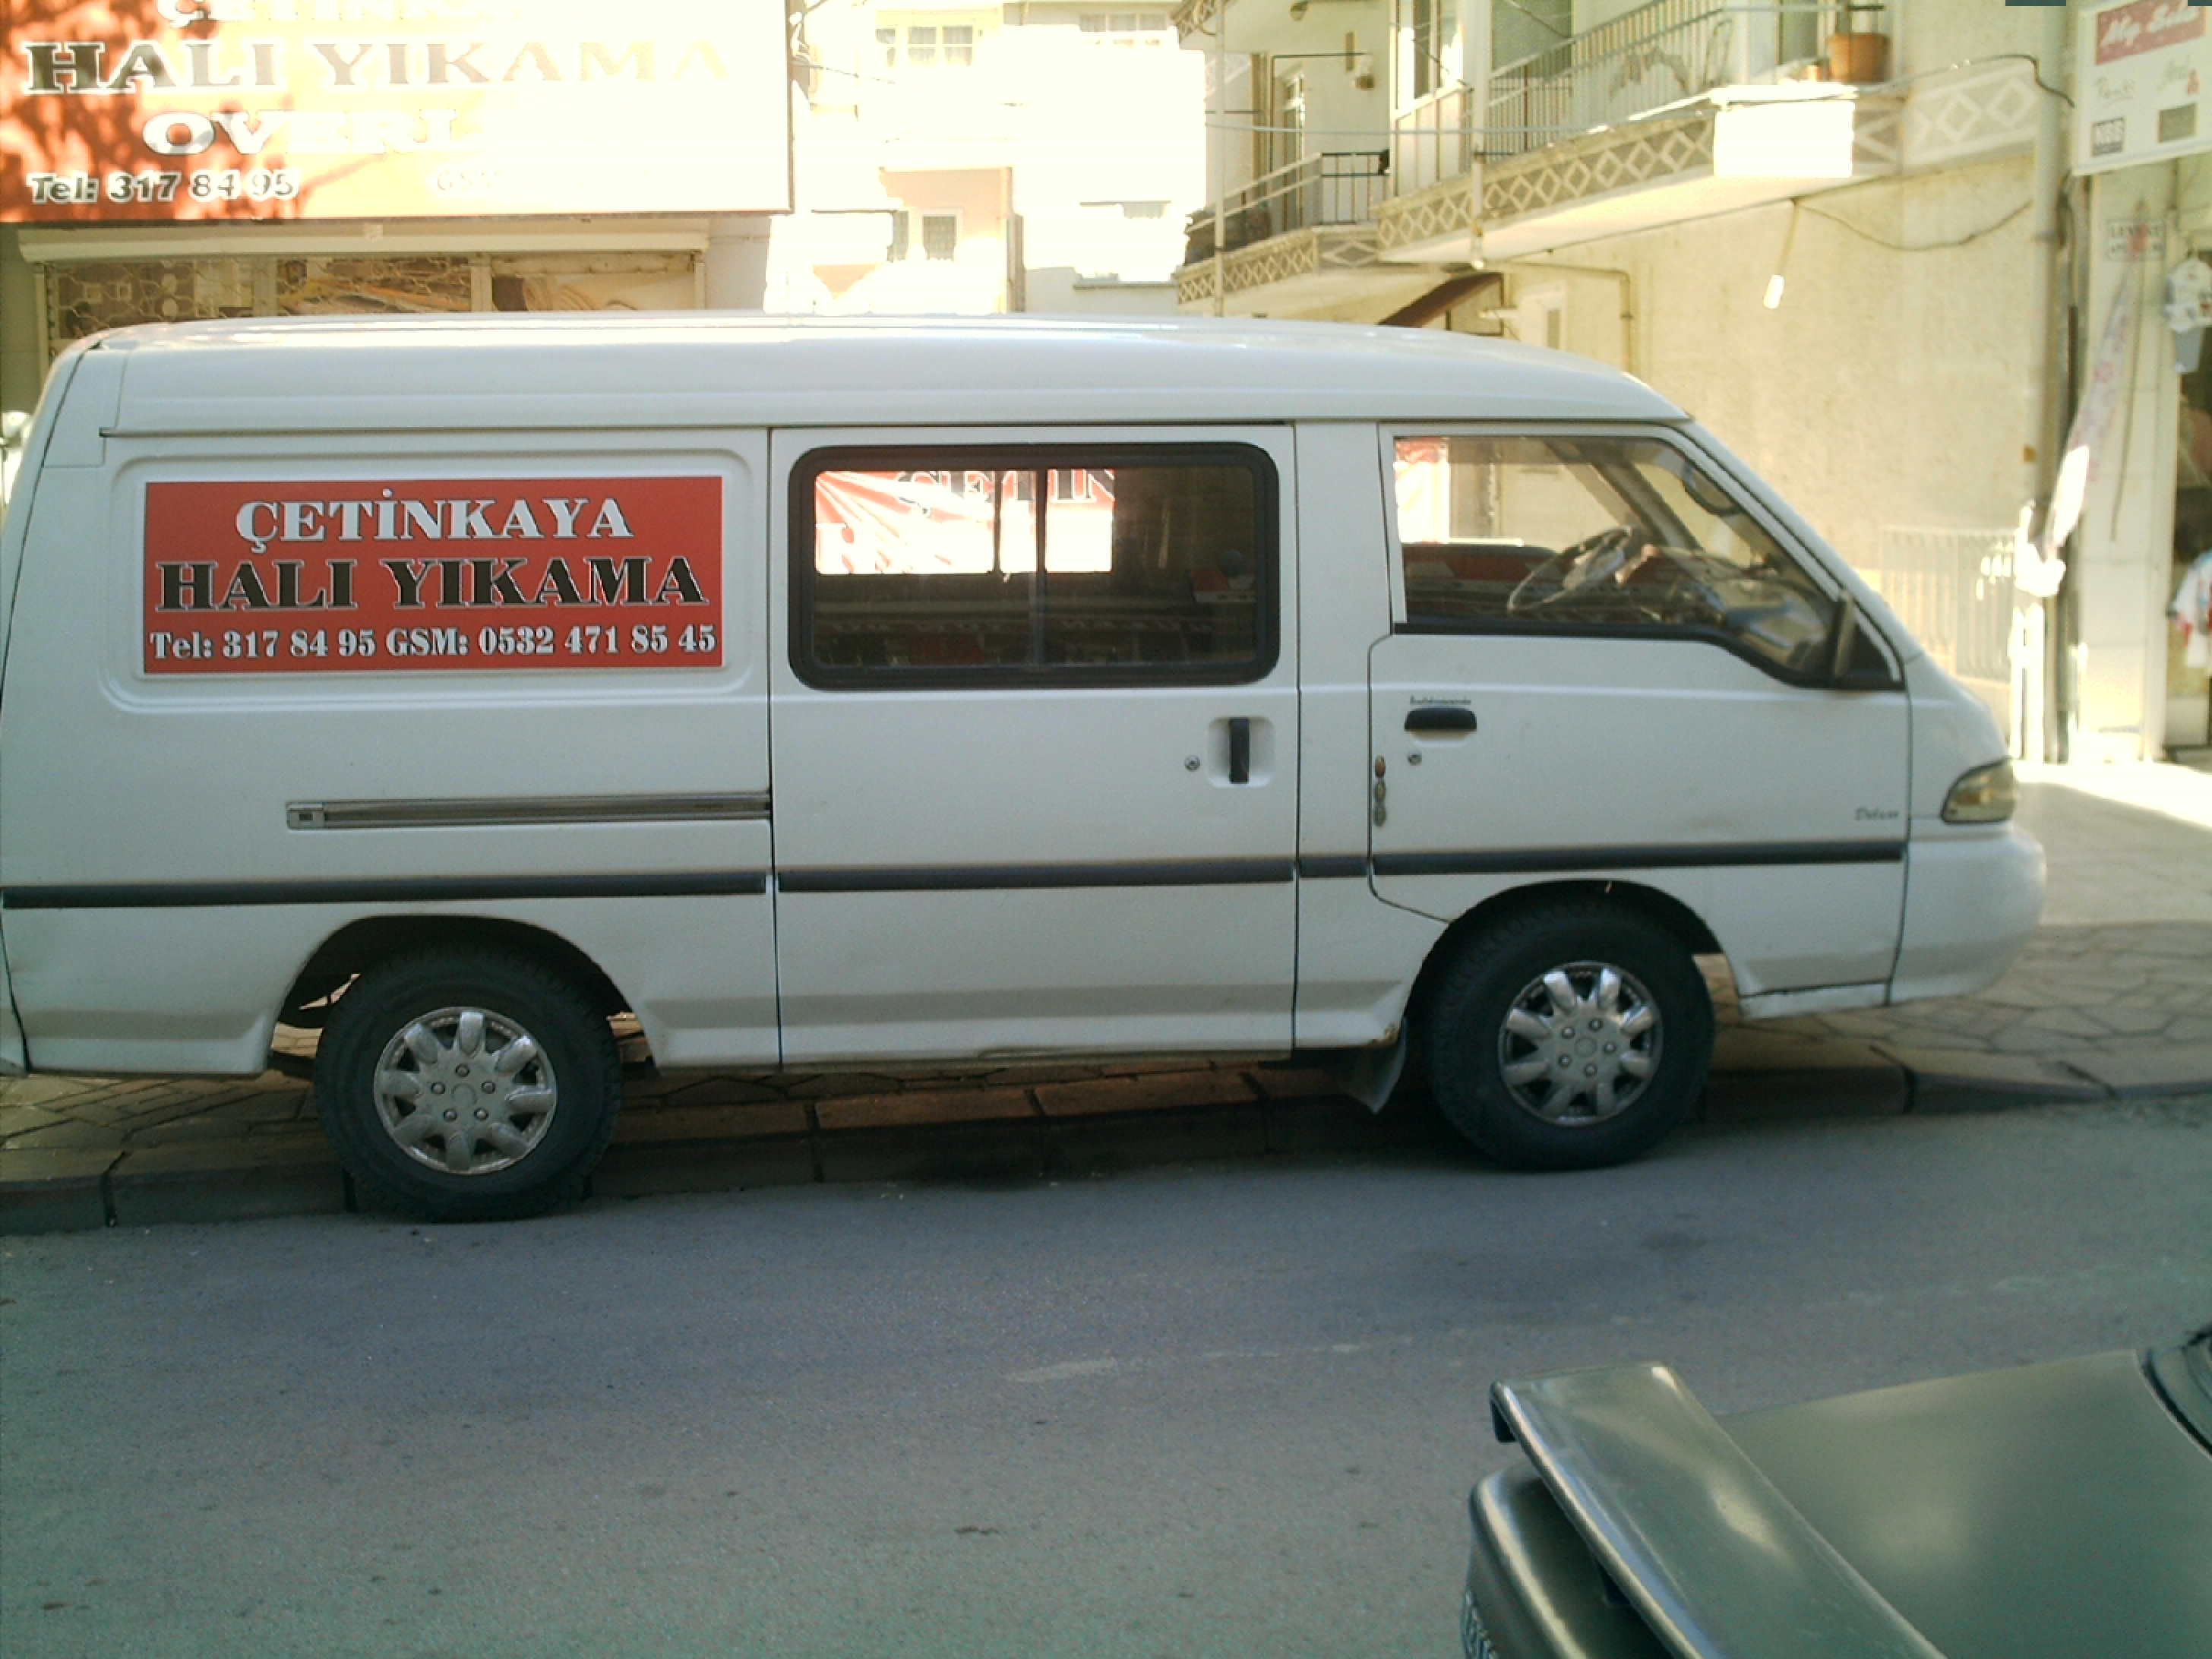 pamuklar_hali_yikama_servis_araci